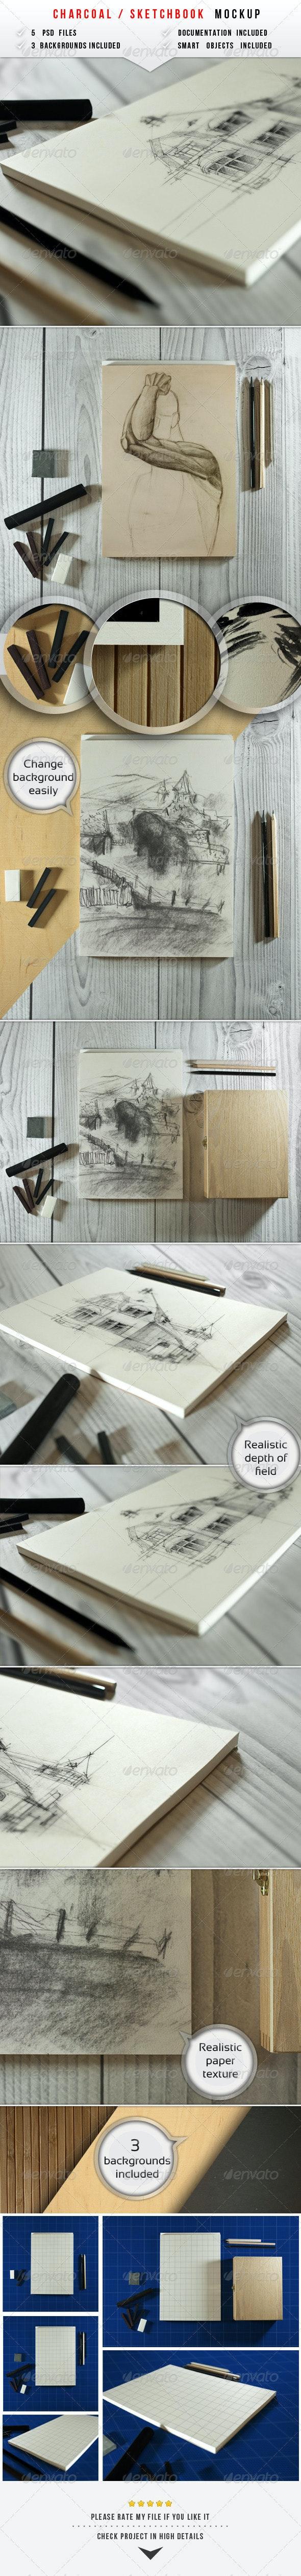 Sketch & Charcoal Mockup - Miscellaneous Product Mock-Ups